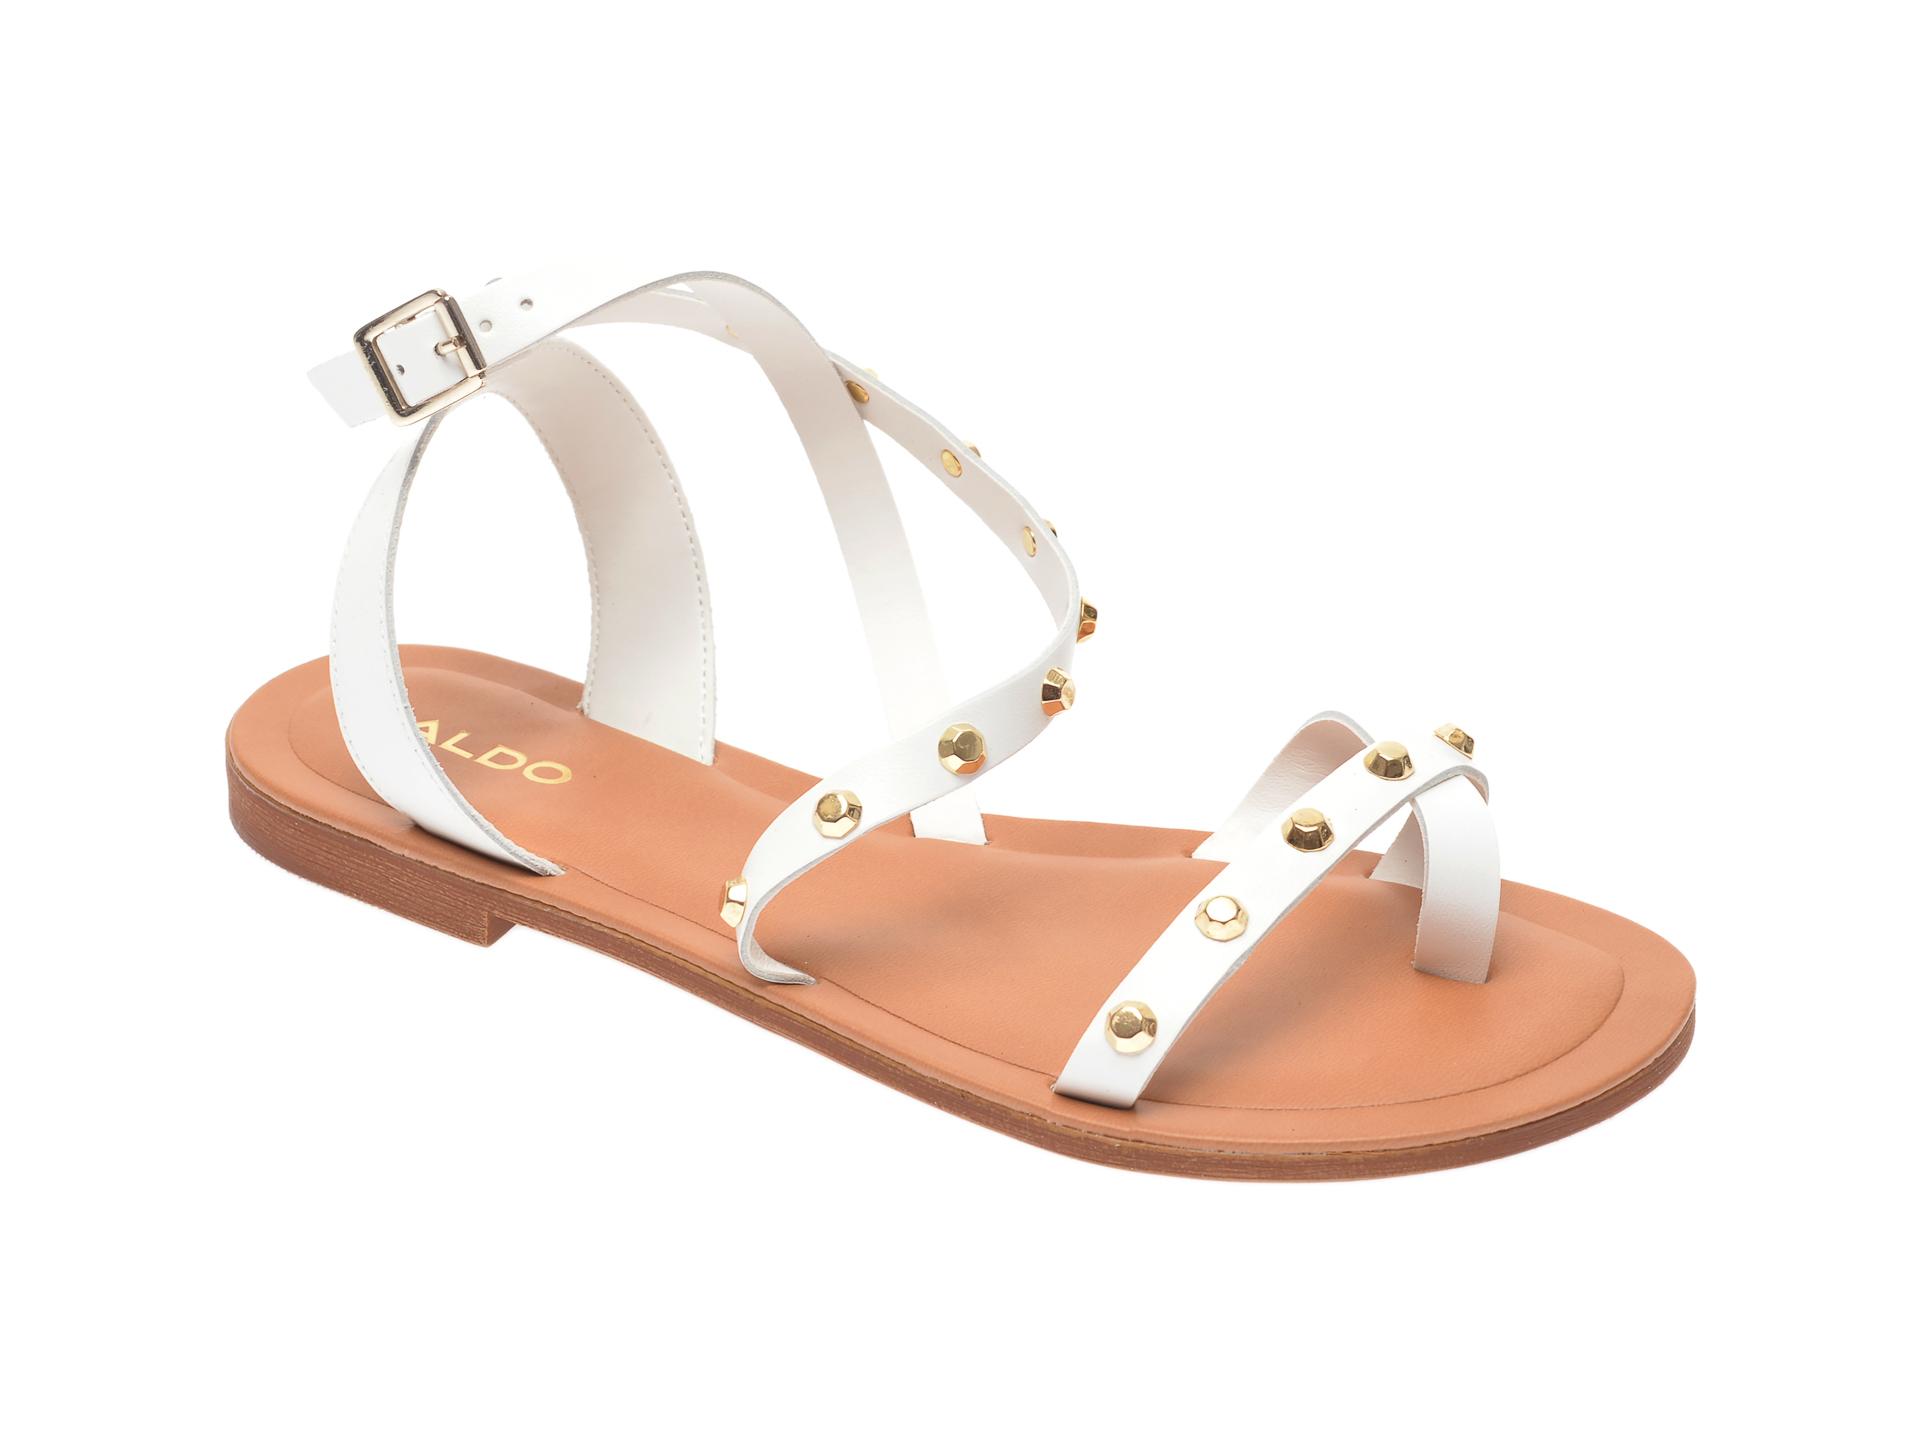 Sandale ALDO albe, Leila100, din piele naturala imagine otter.ro 2021